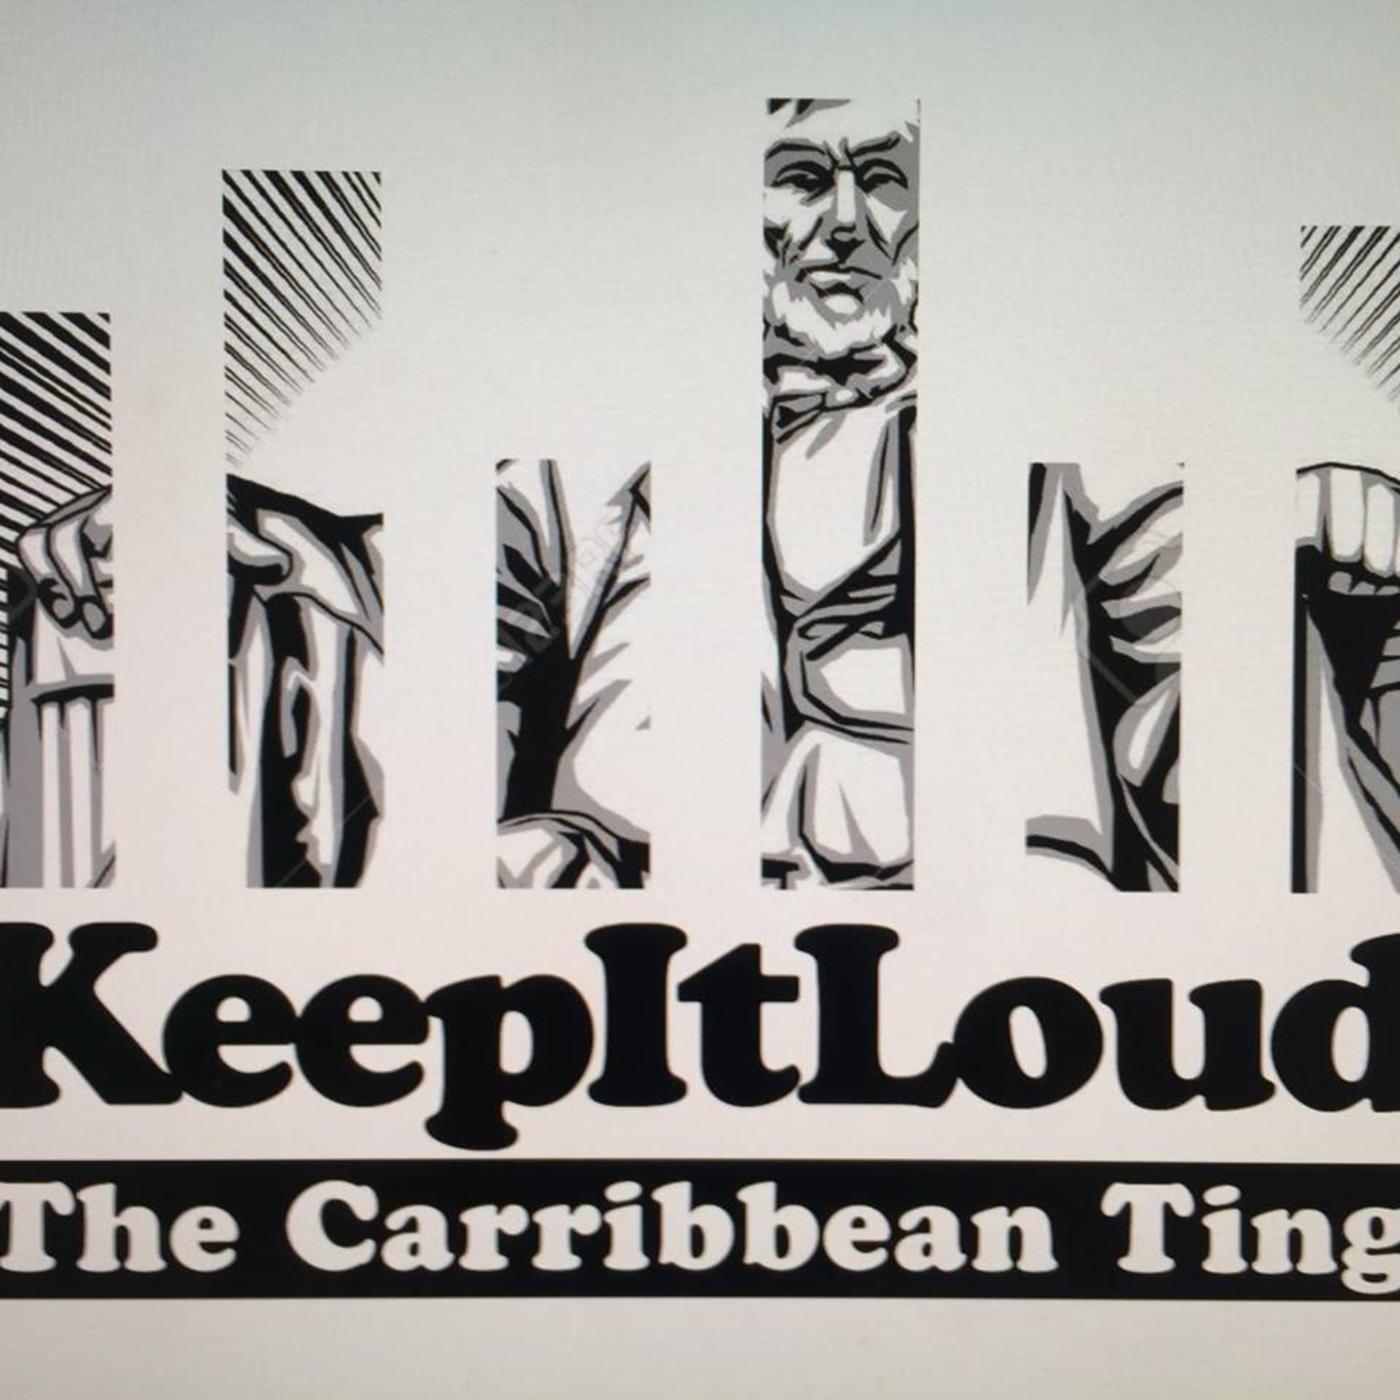 KeepItLoudCrew